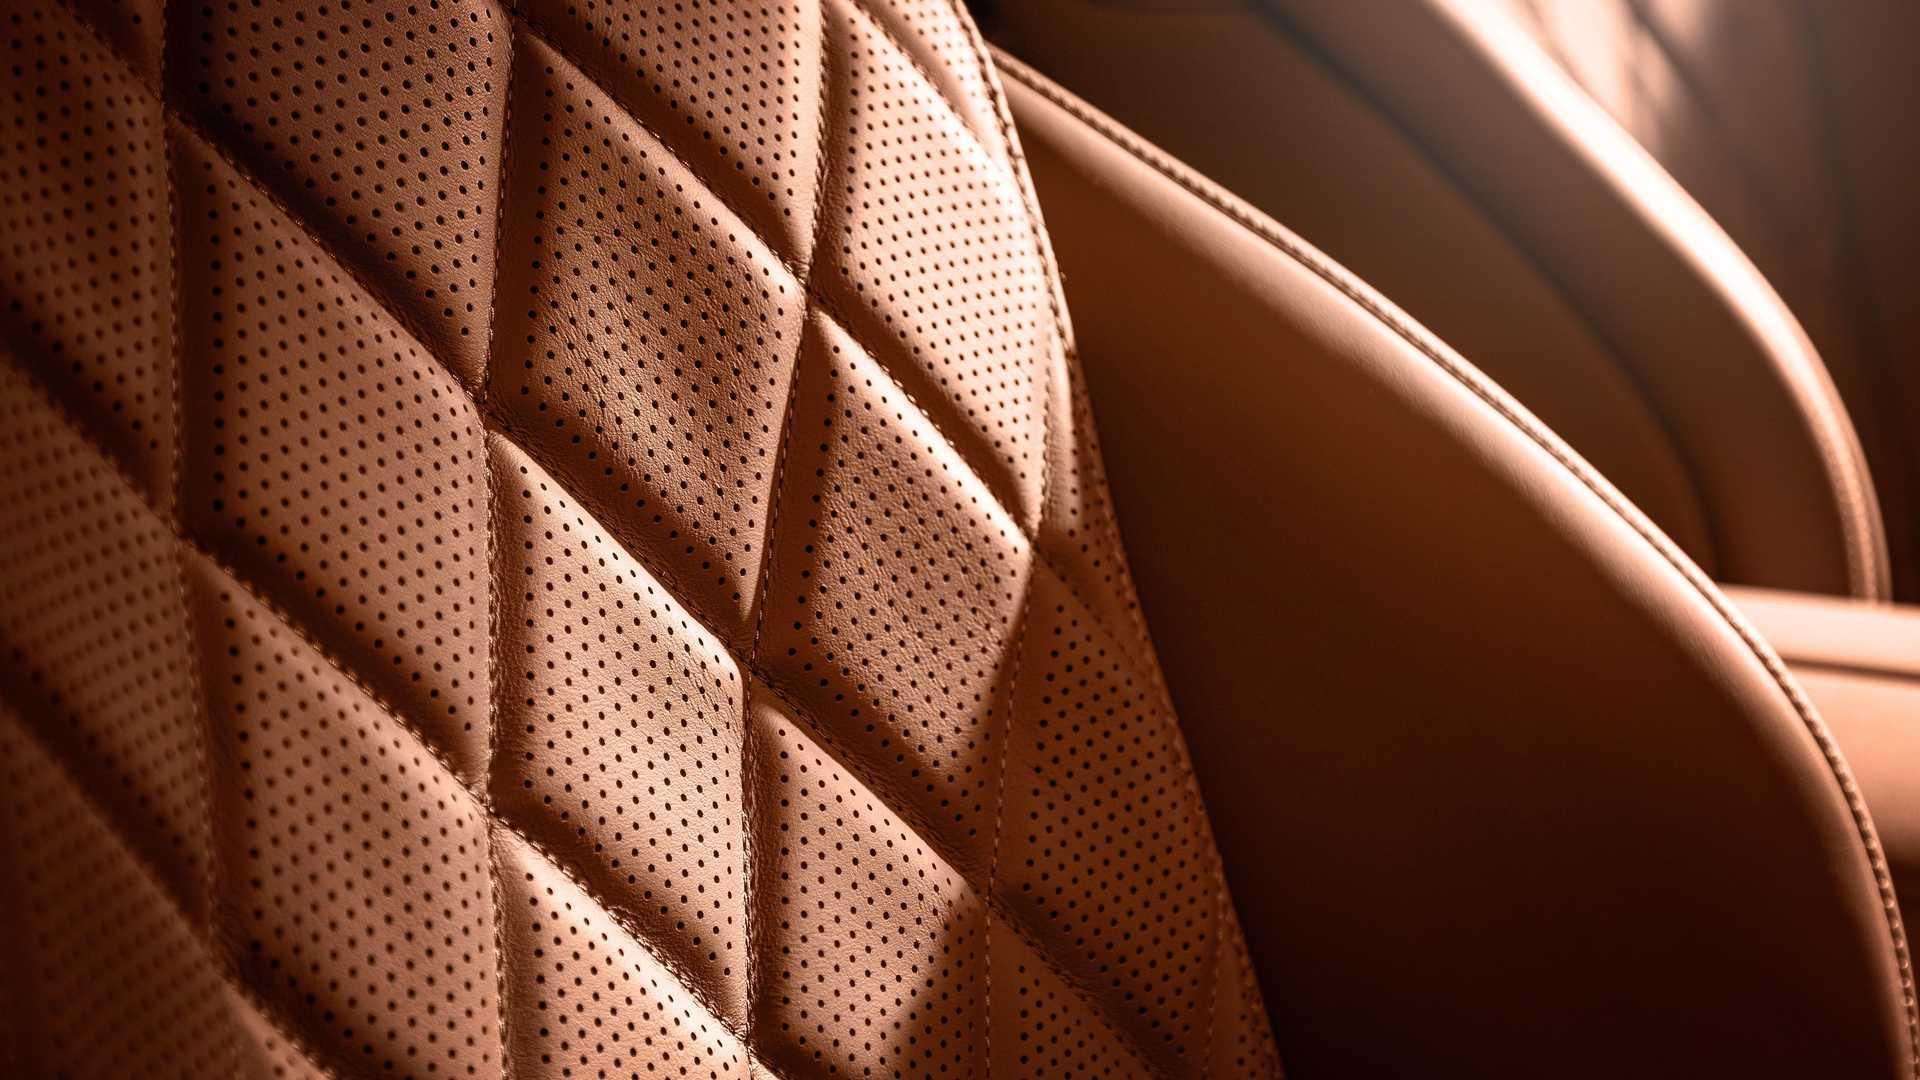 2021-mercedes-benz-s-class-interior-details